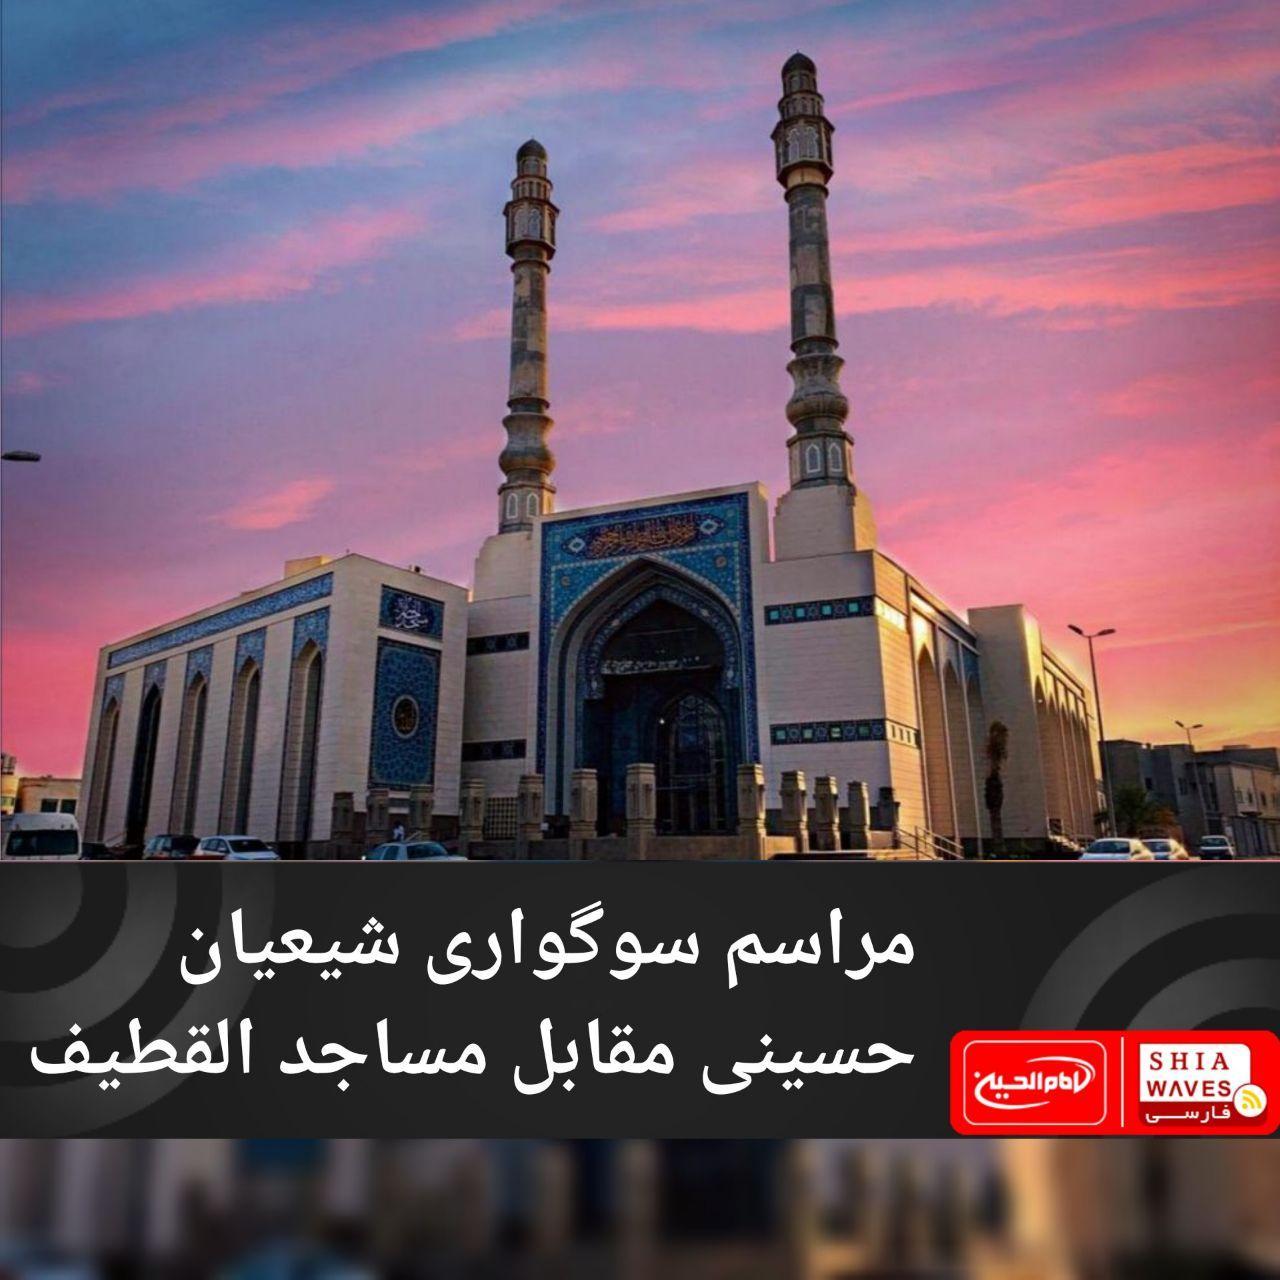 تصویر مراسم سوگواری شیعیان حسینی مقابل مساجد القطیف